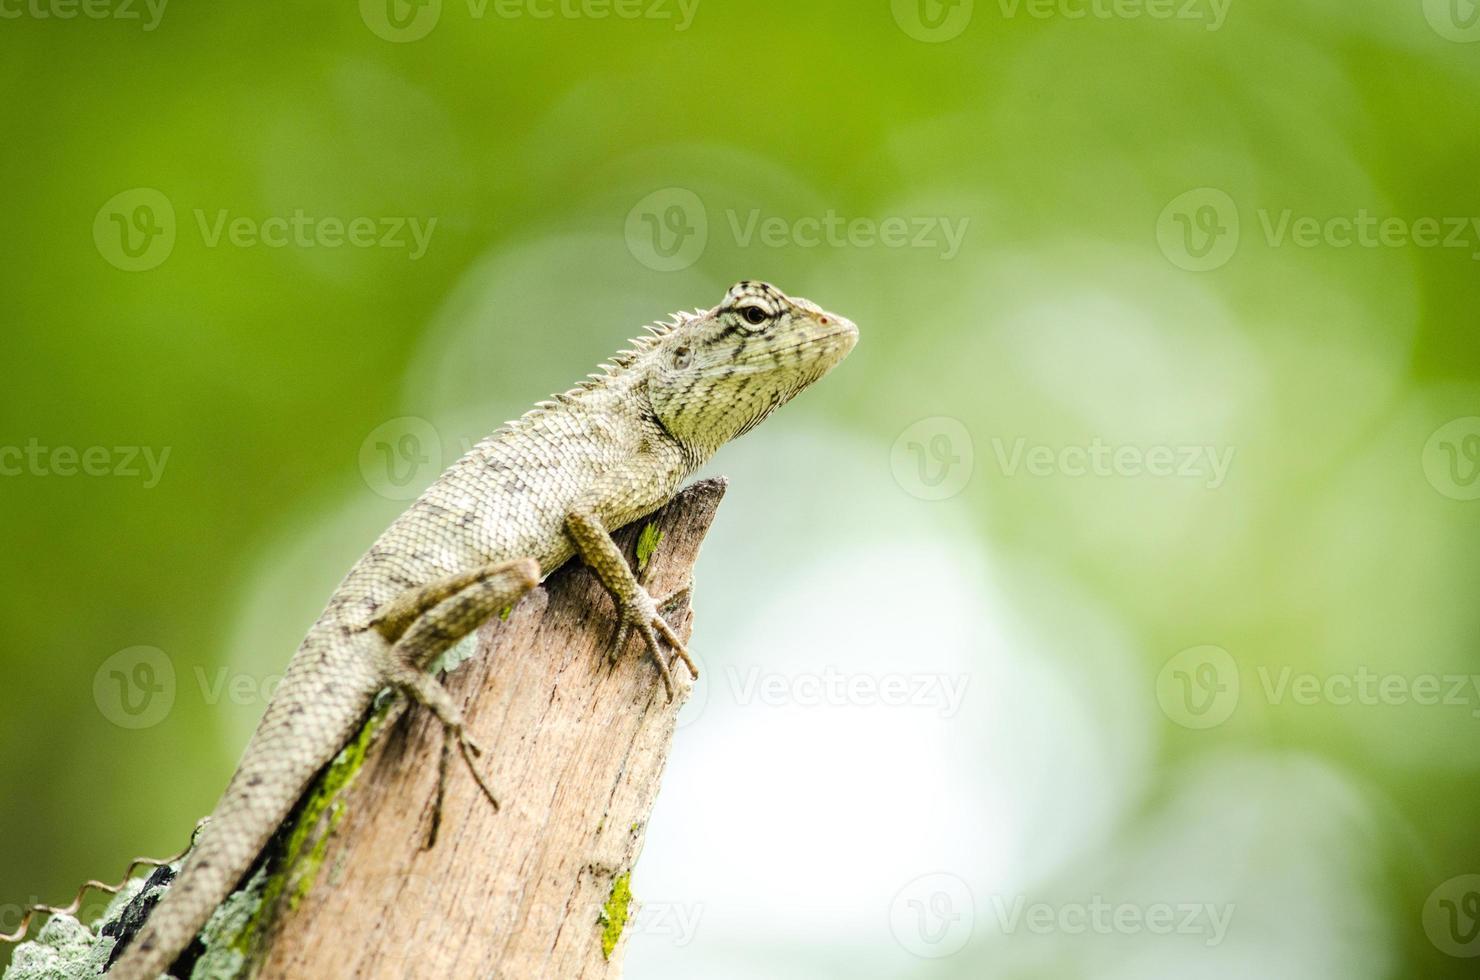 calotes emma alticristatus é spcies nome de réptil foto